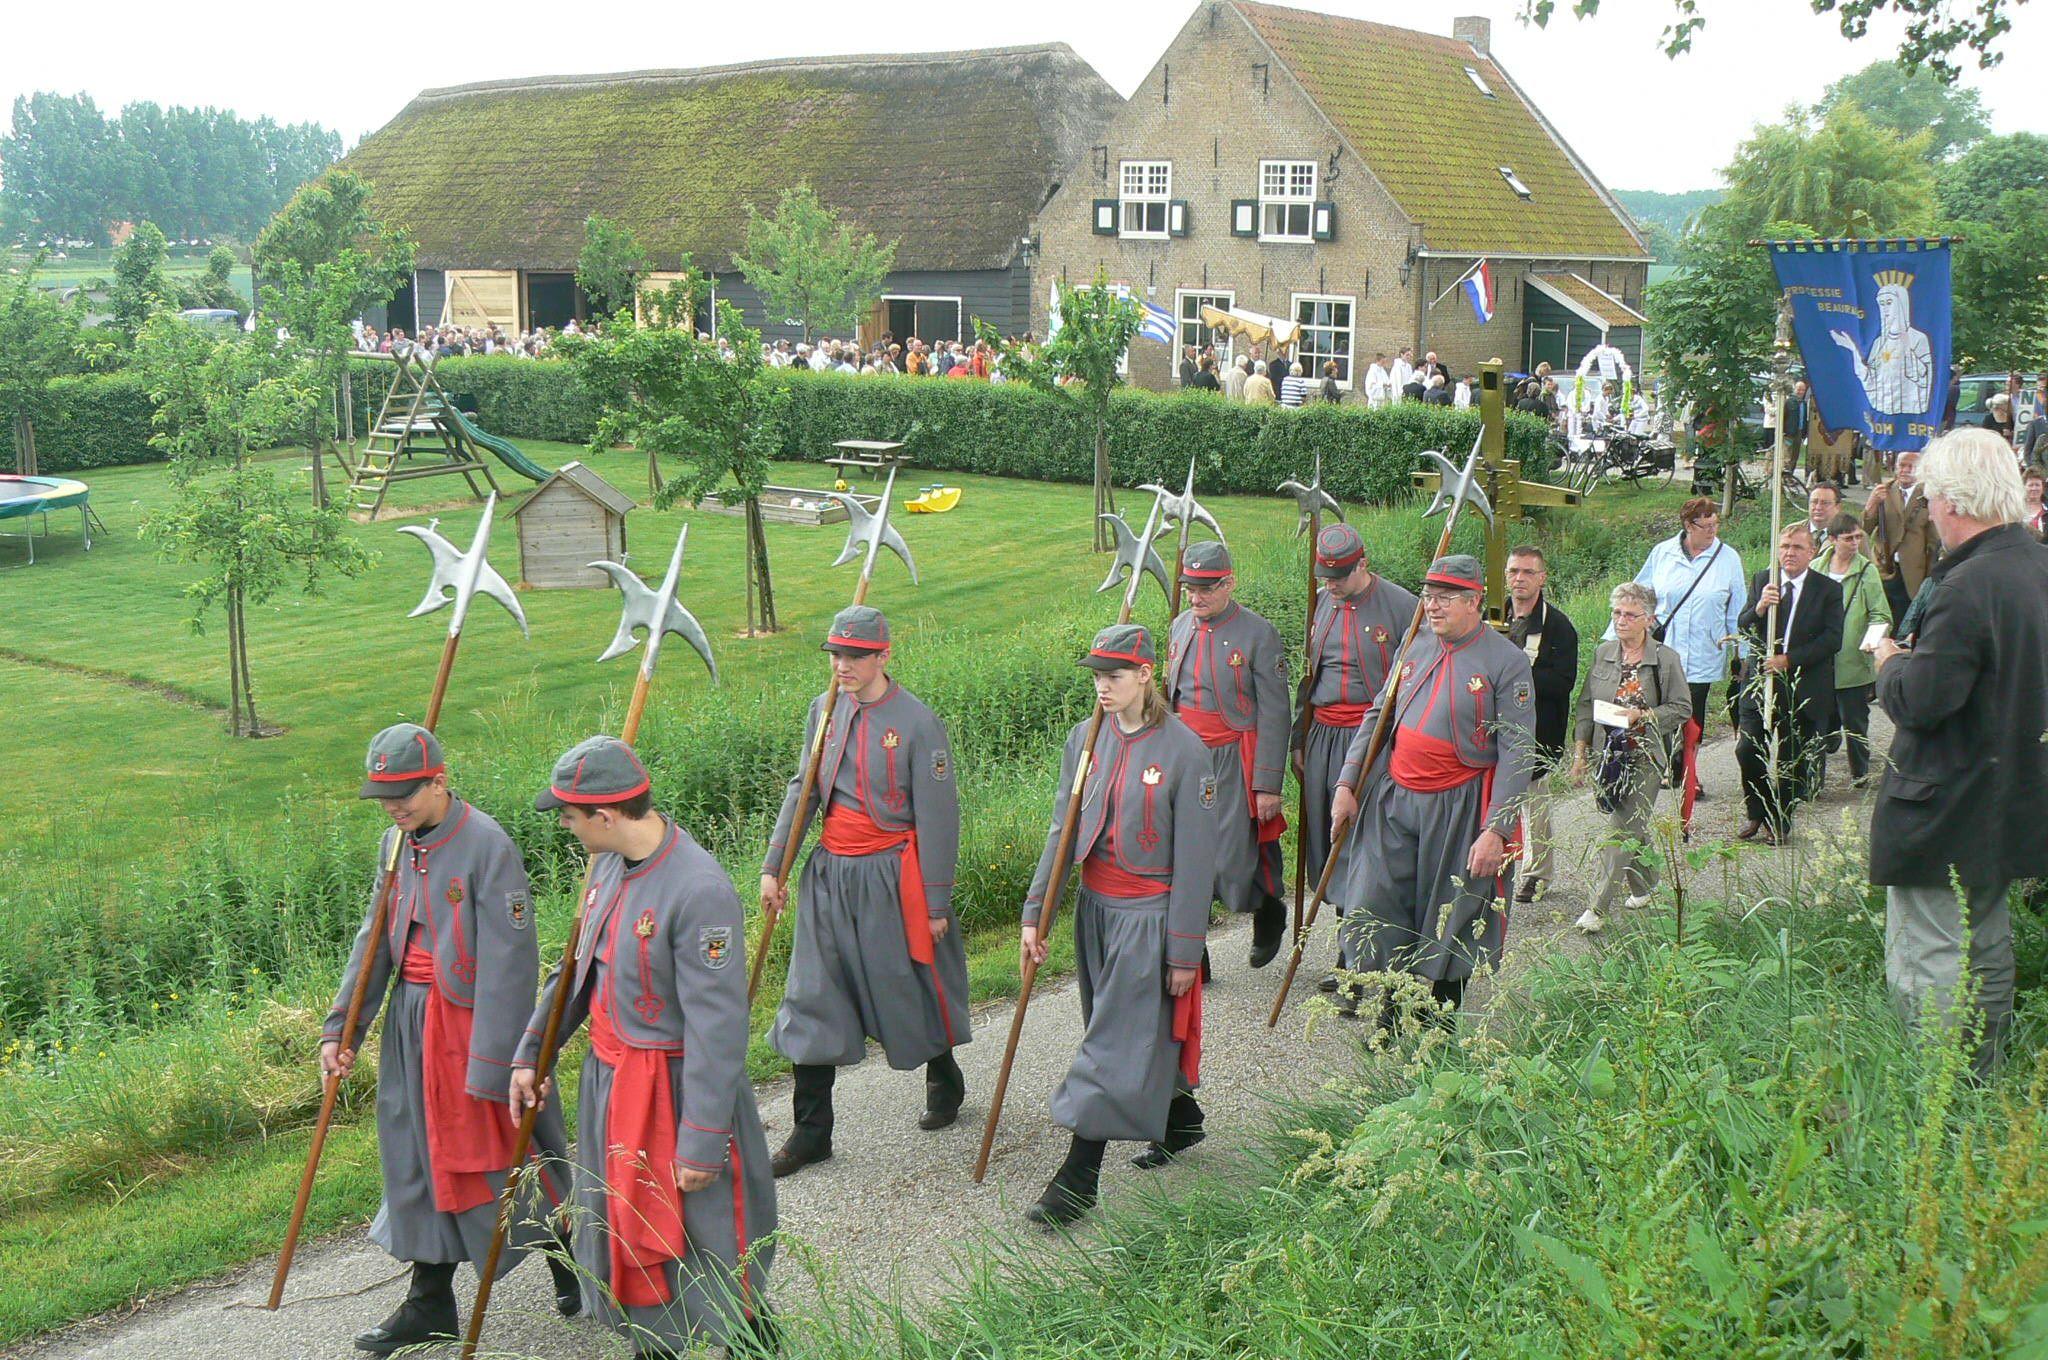 Sacramentsprocessie in Kwadendamme. (Beeldbank SCEZ)